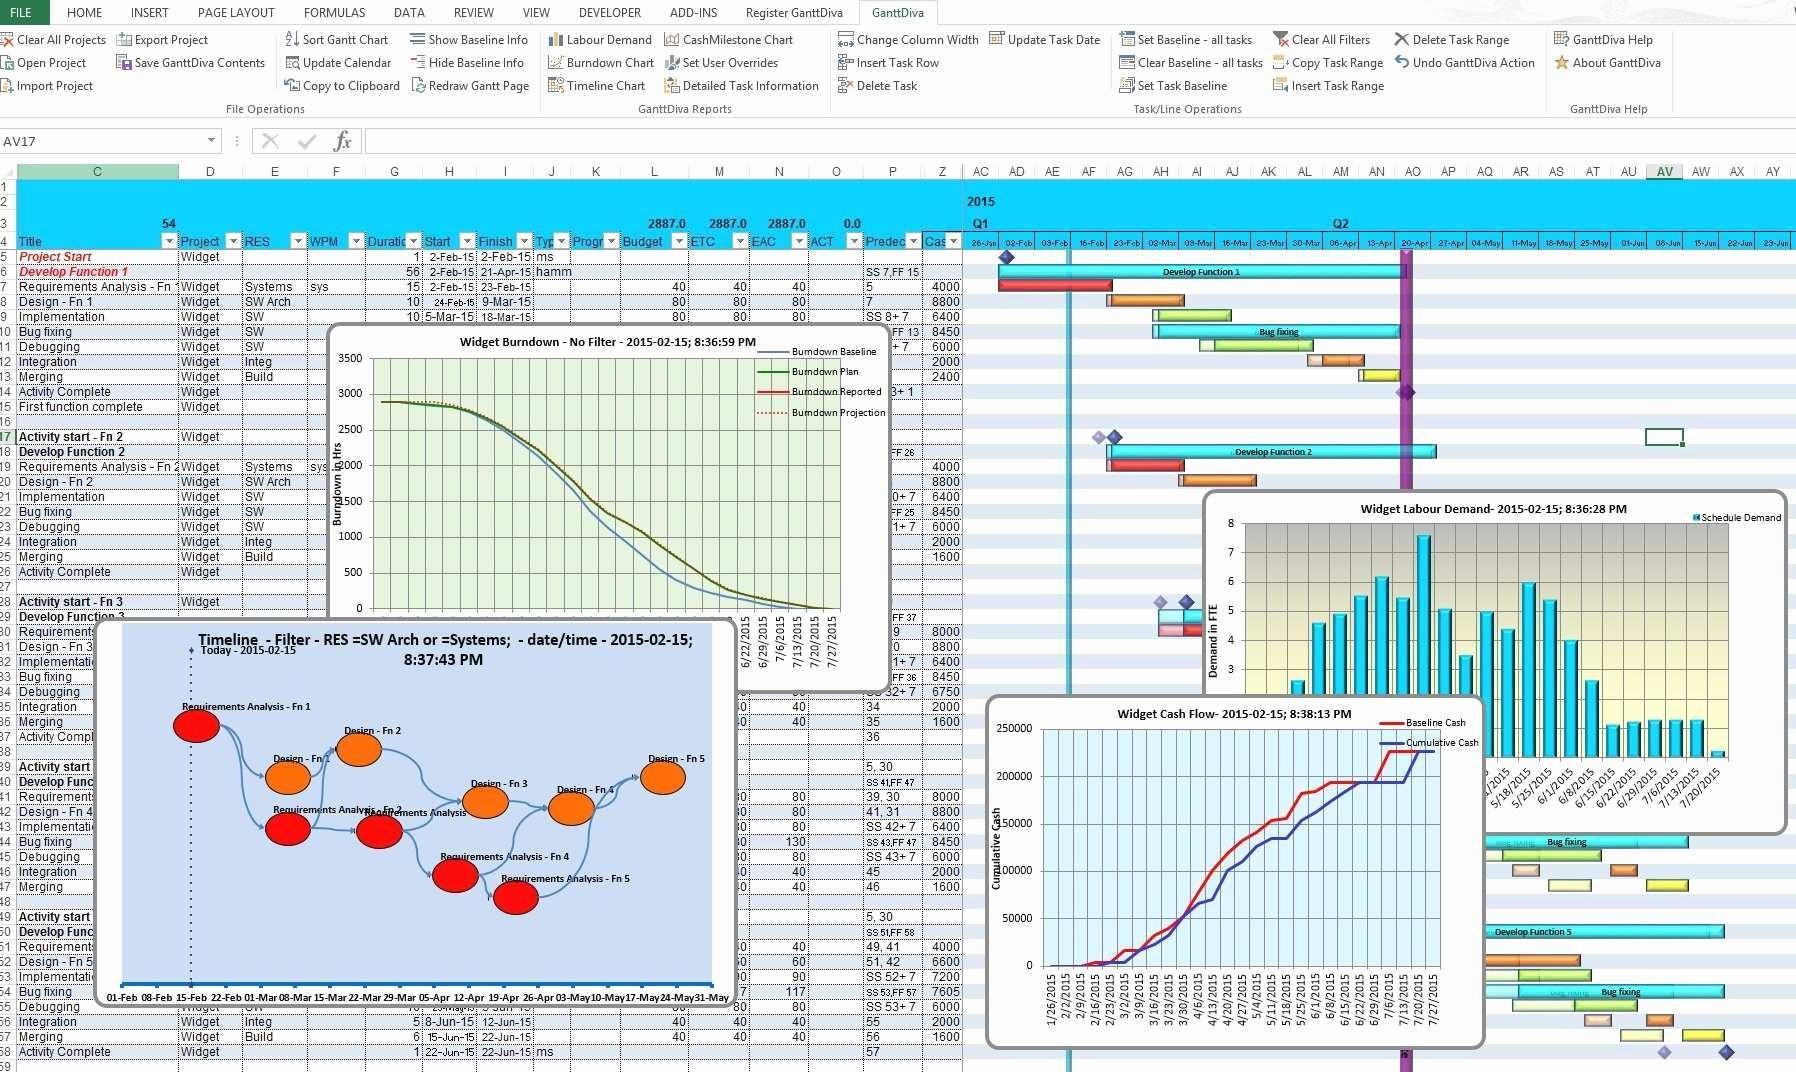 Excel Gantt Project Planner Template Luxury Awesome Gantt Project Planner Template with Microsoft